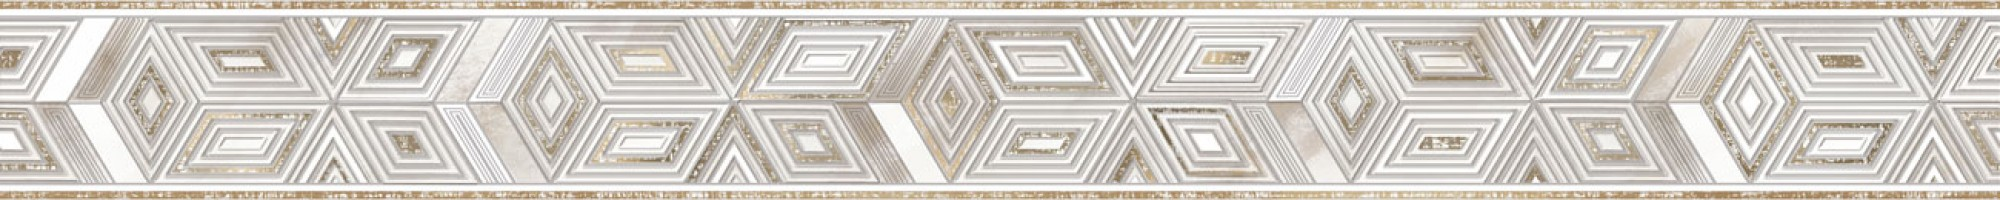 Бордюр Alma Ceramica Modena 6х60 BWU60MOD004